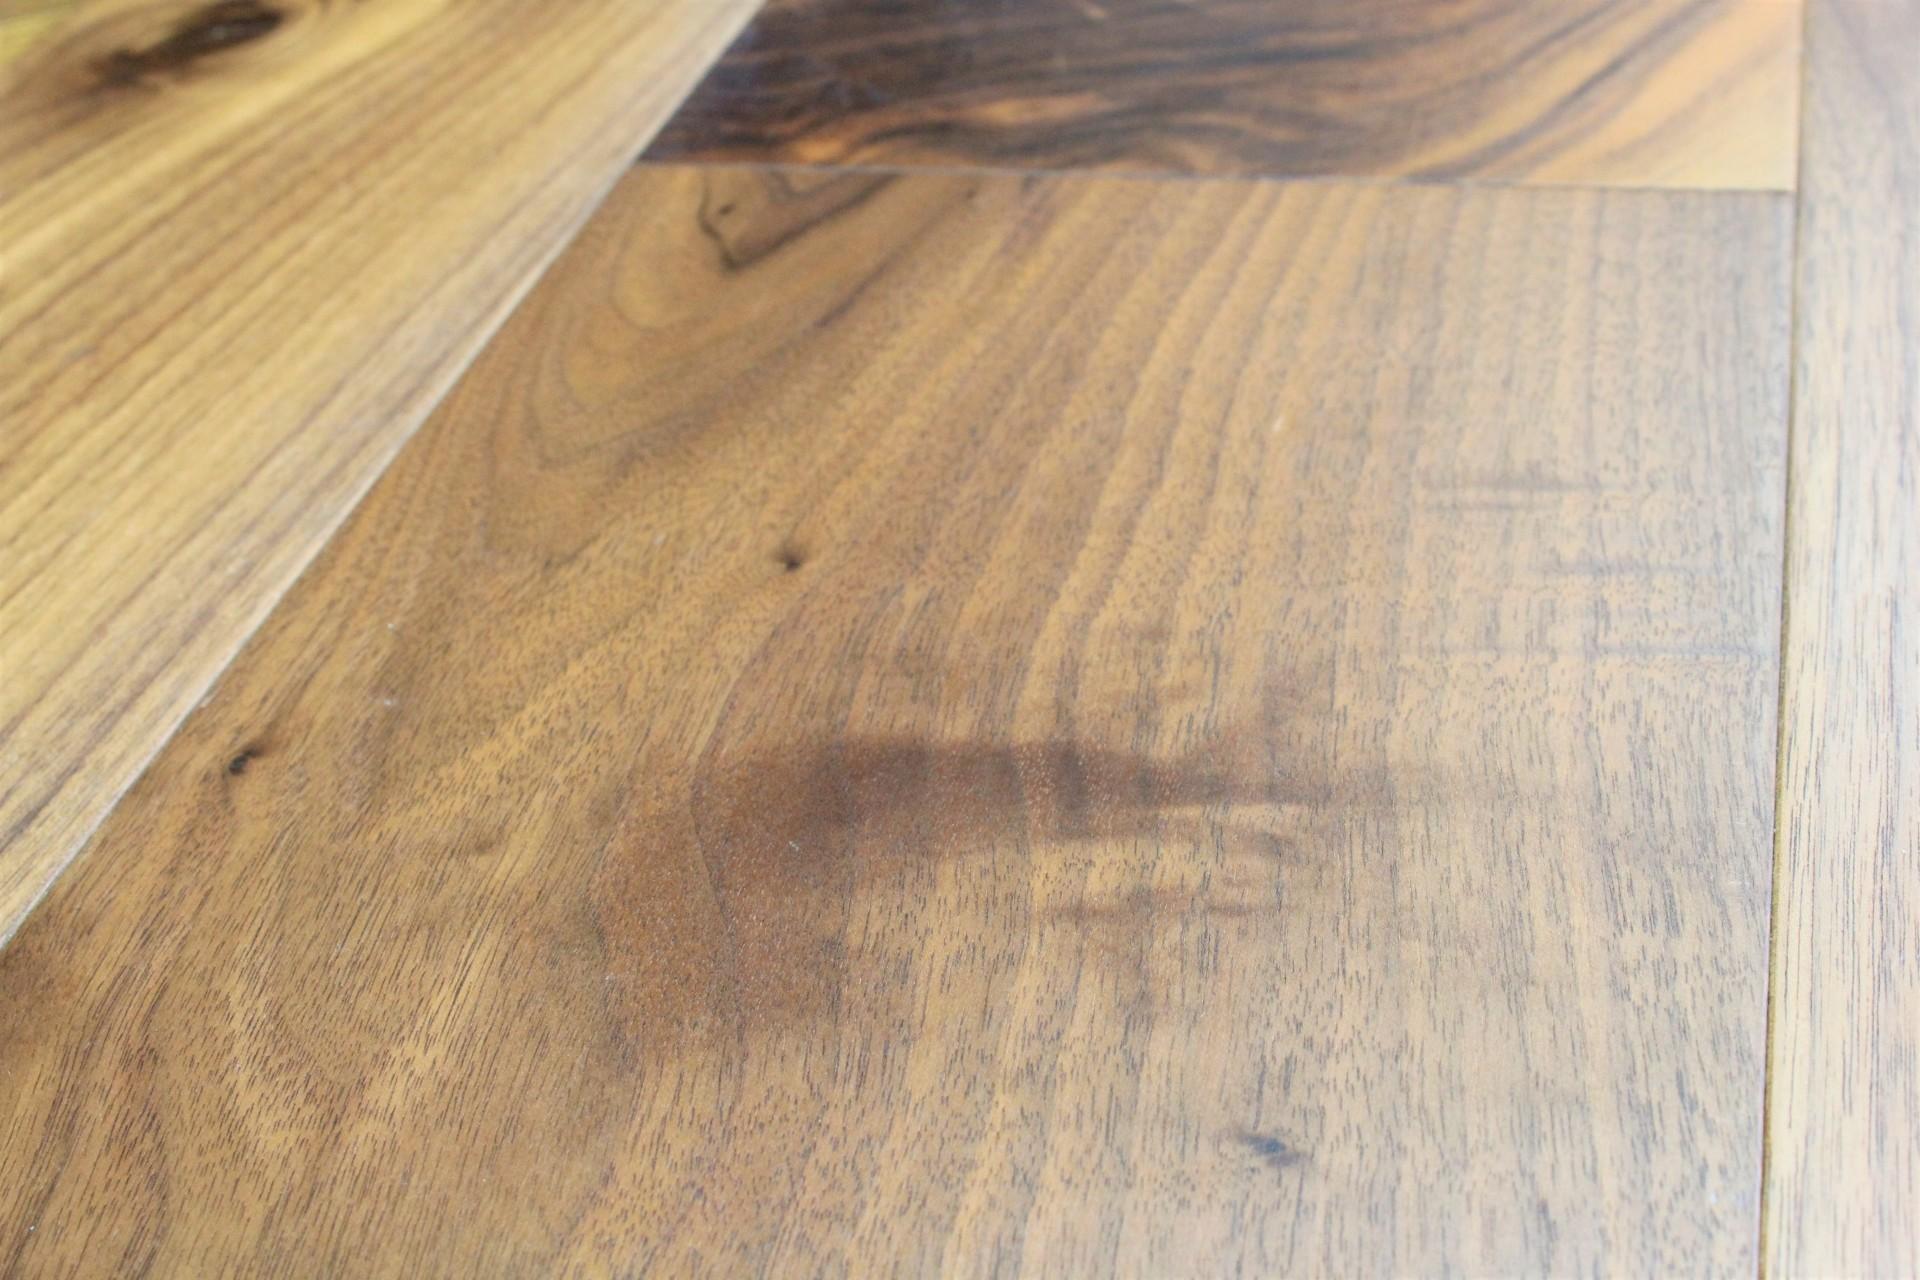 Hardwood, prefinished floor, engineered wood, solid wood, lifestyle, hard surface, prefinished hardwood, prefinished wood, home, design, interior design, wood floor design, pinnacle